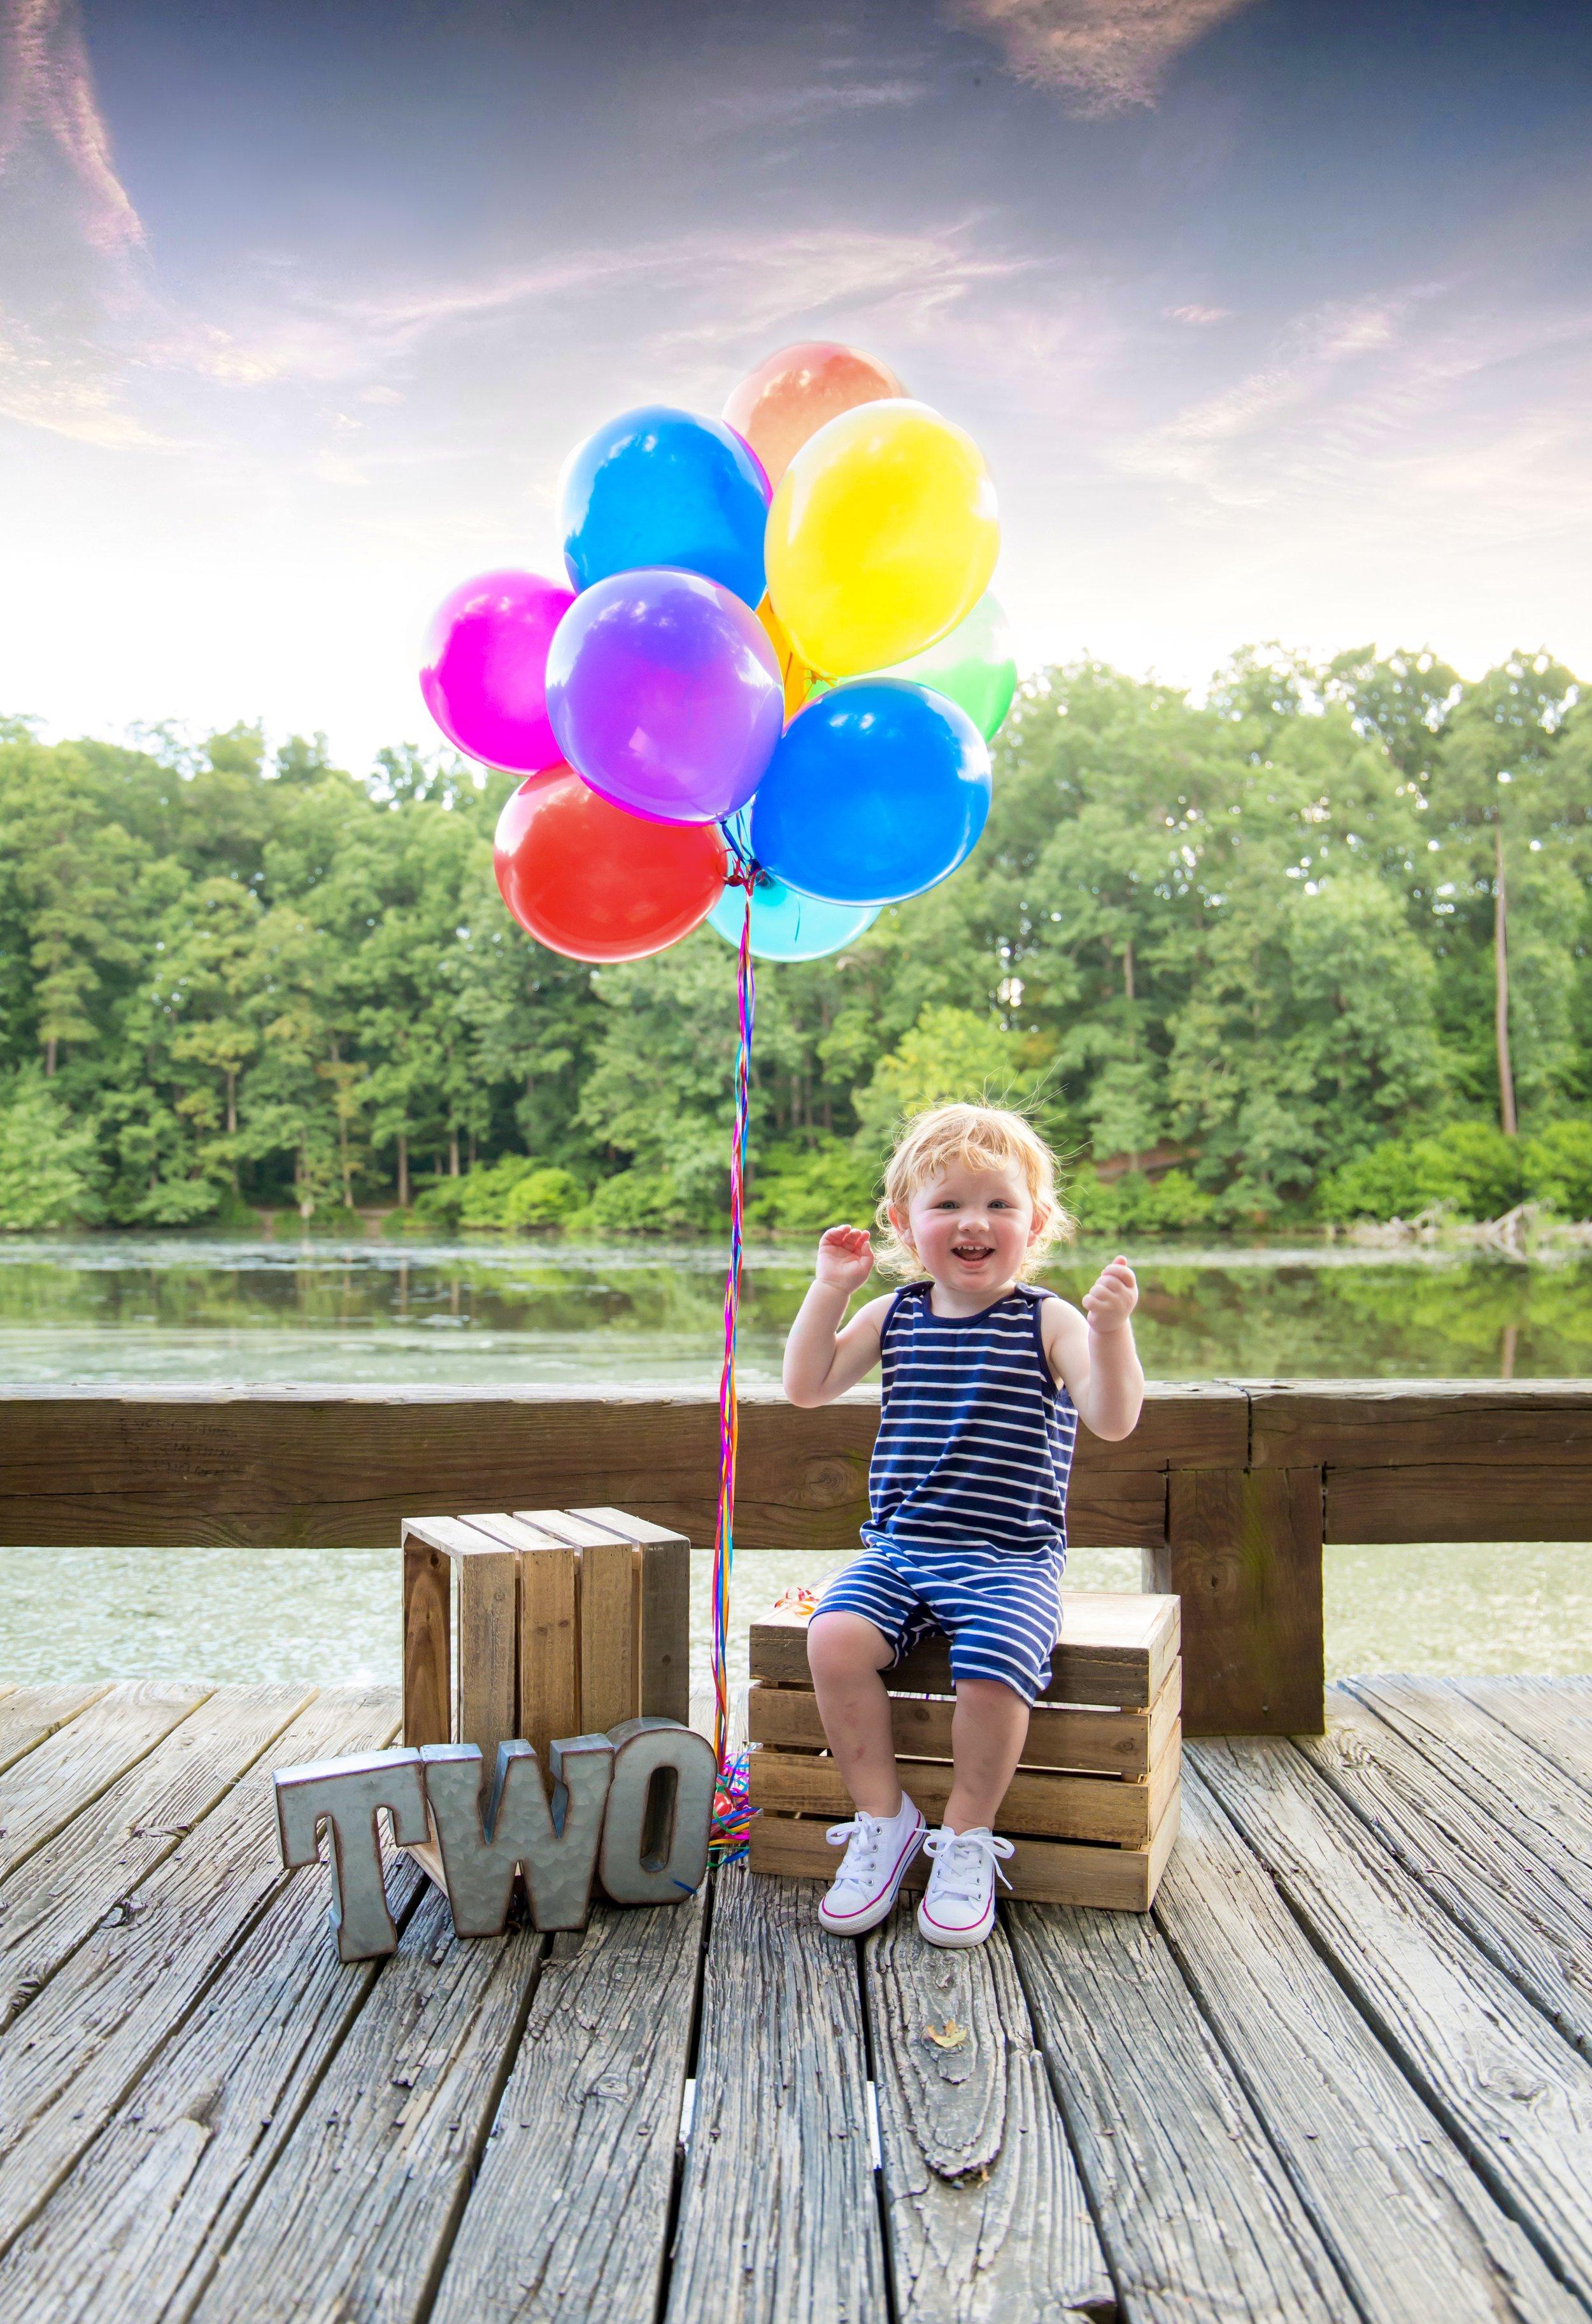 adorable-balloons-birthday-1210063.jpg